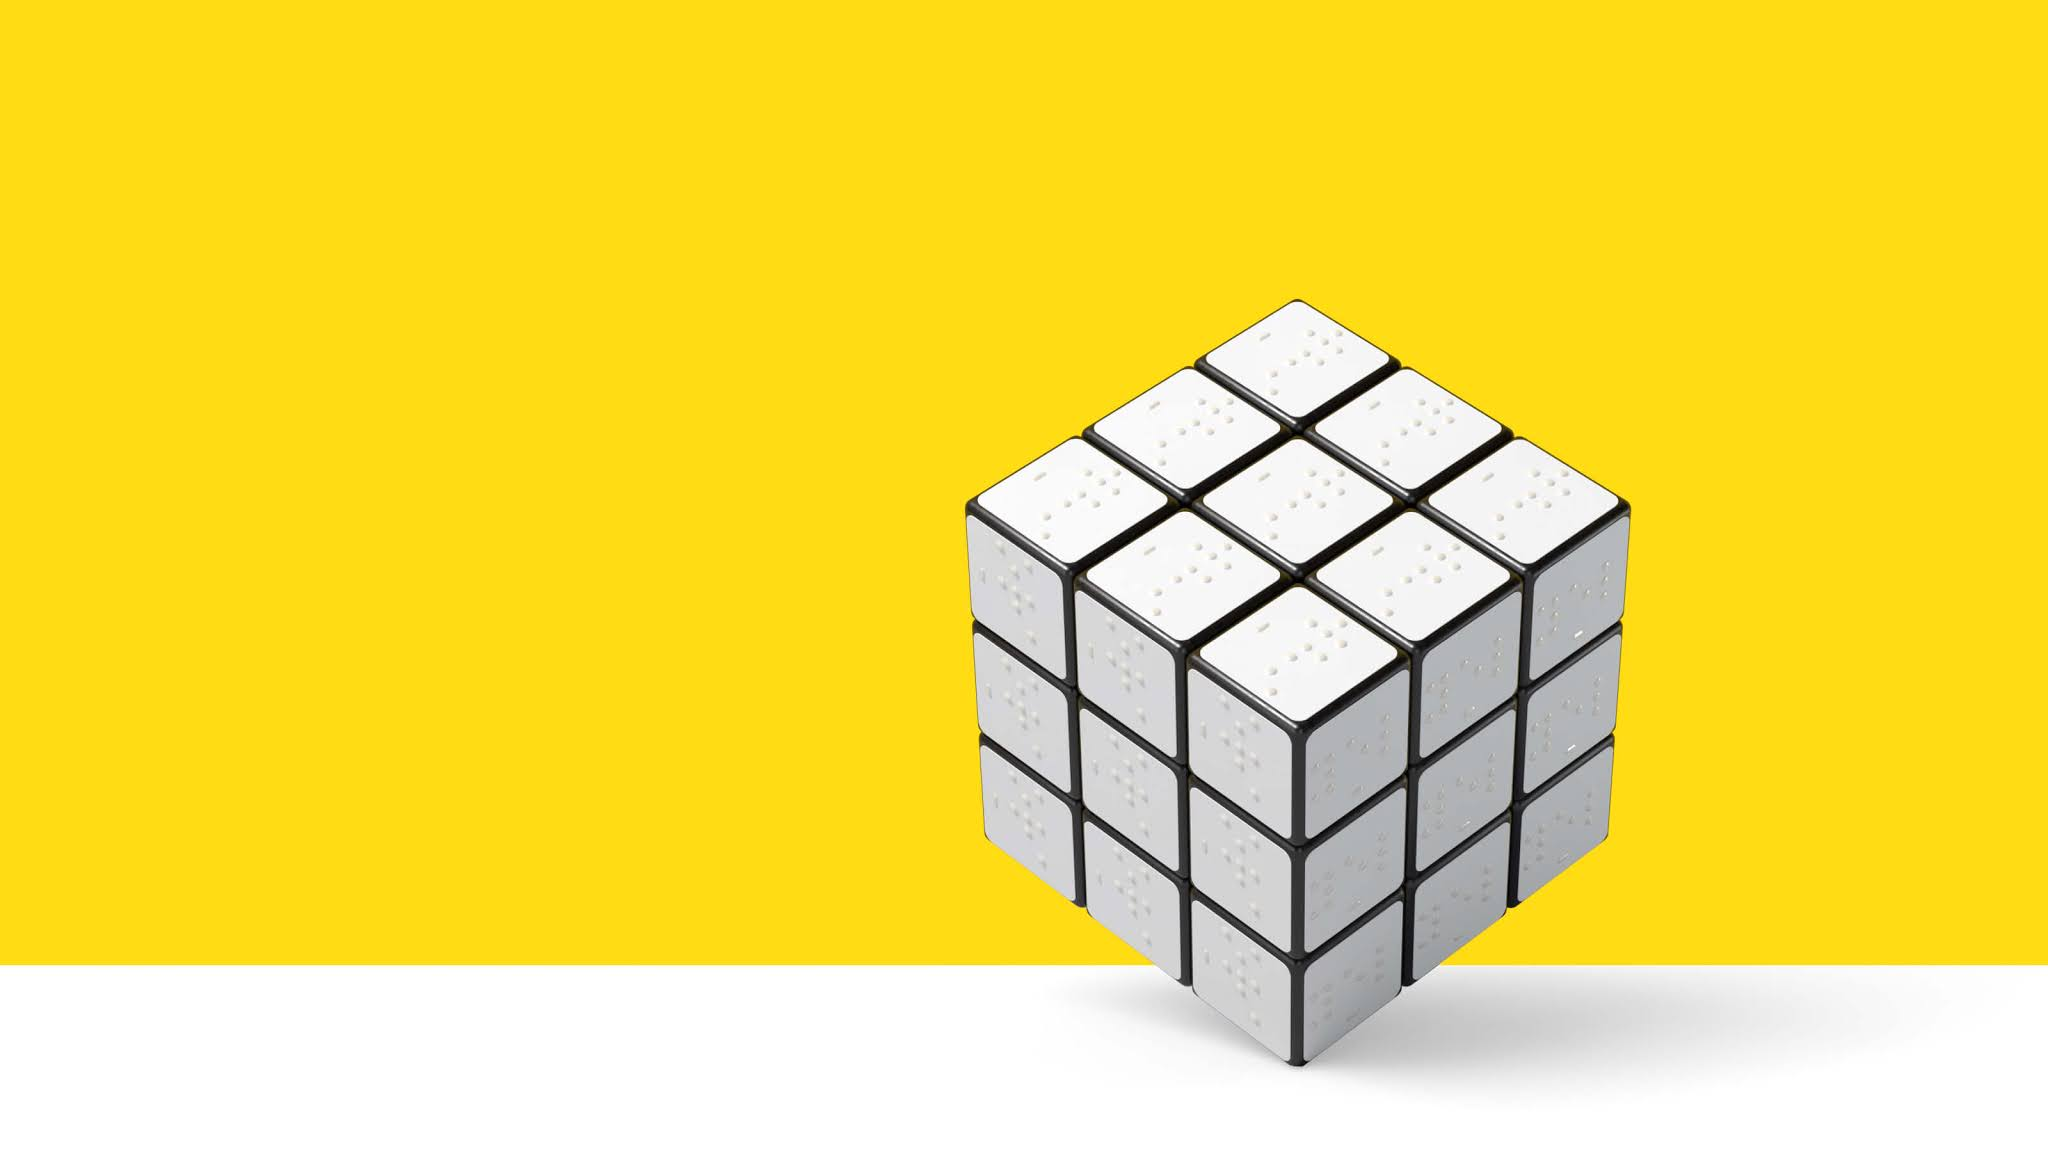 braillecube for blind people tuna netra speedcuber